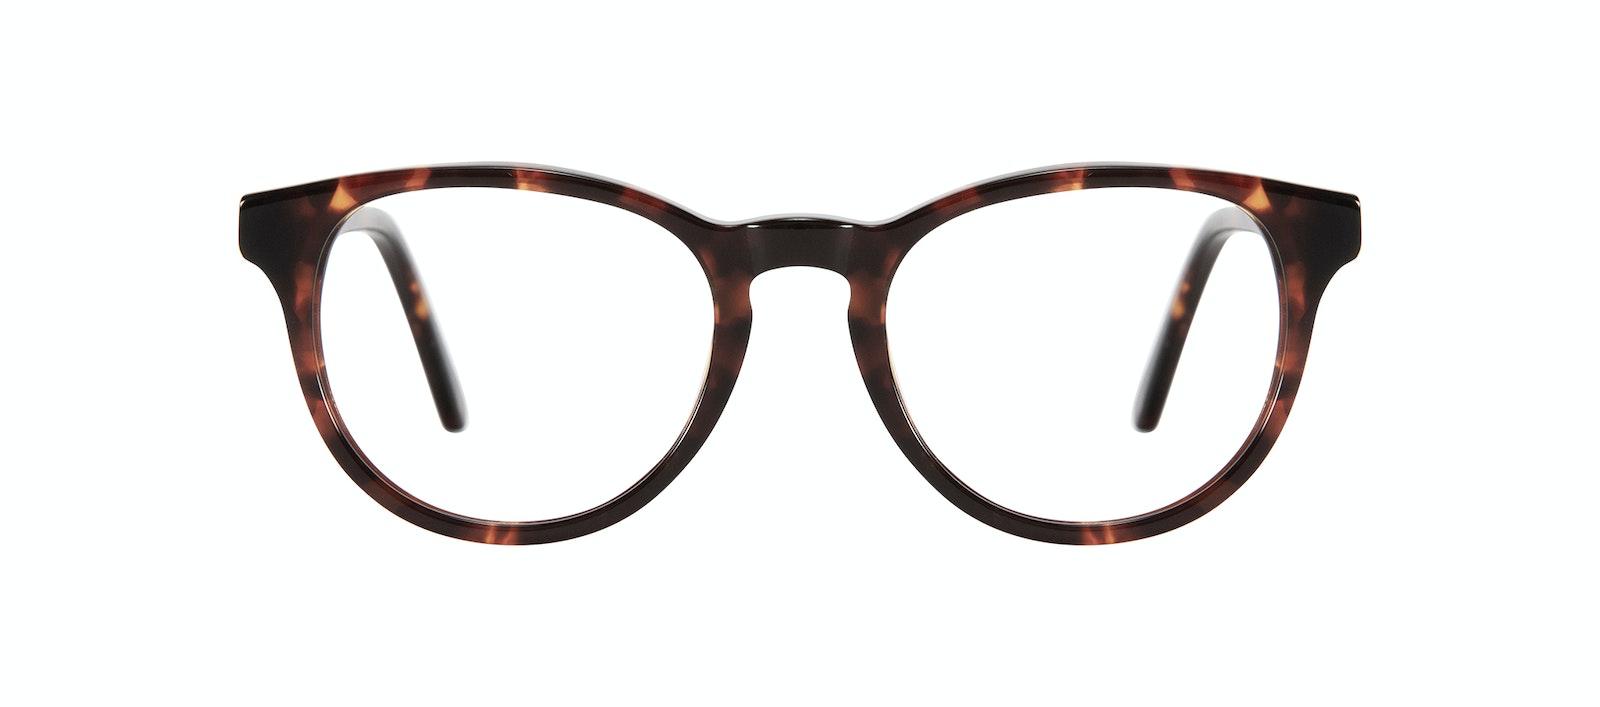 Affordable Fashion Glasses Round Eyeglasses Kids Cult Junior Sepia Kiss Front